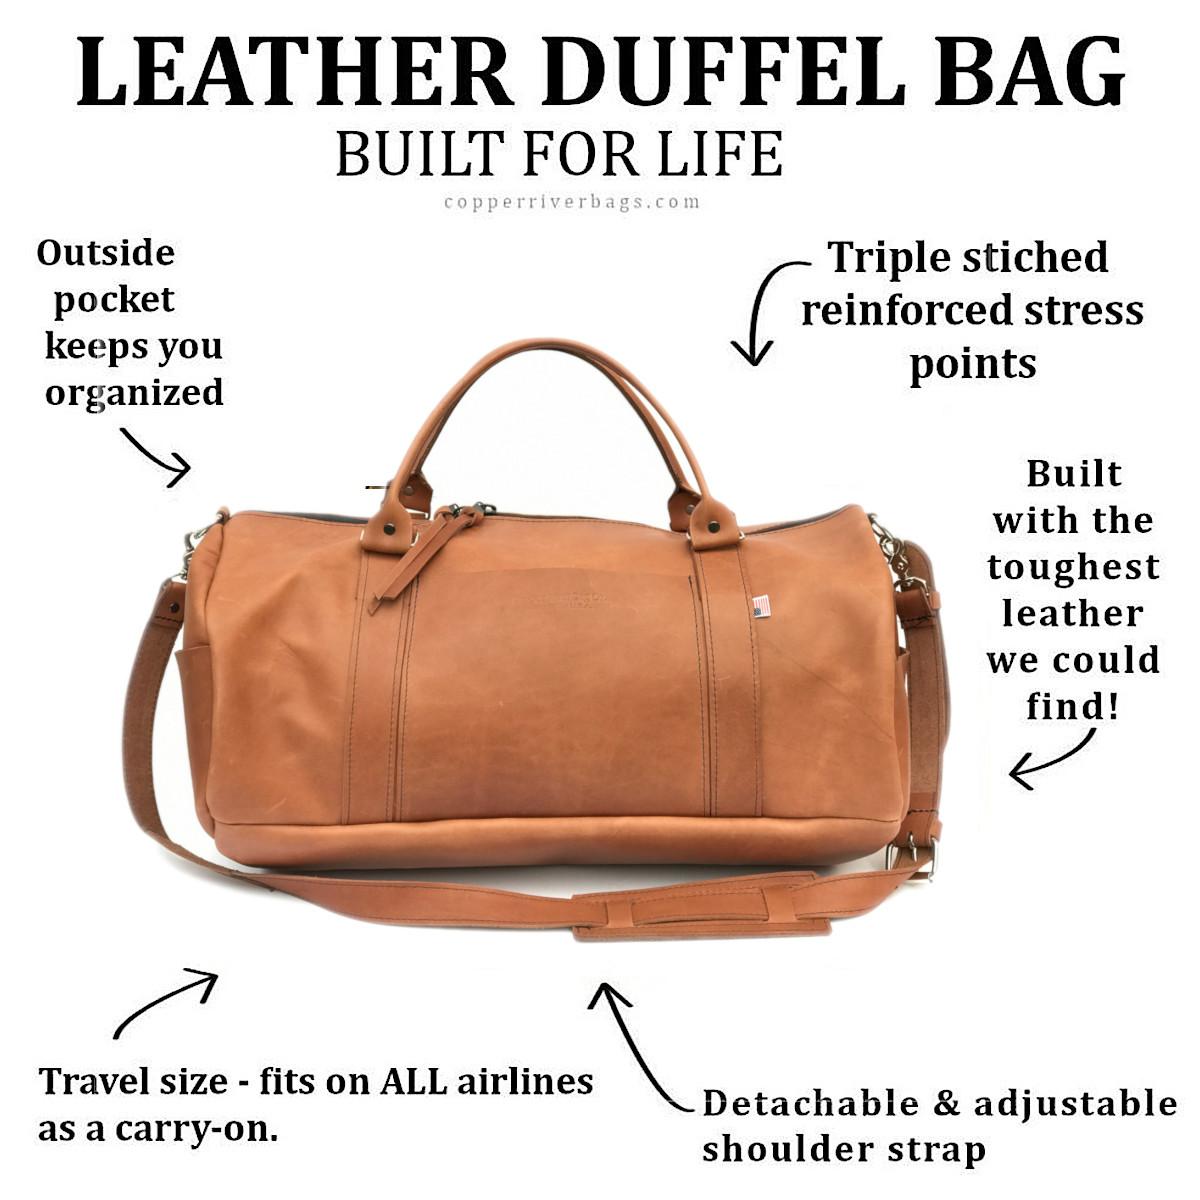 vintage-tan-duffel-3414-google-disply-ad-logo-1200-x-1200-.jpg